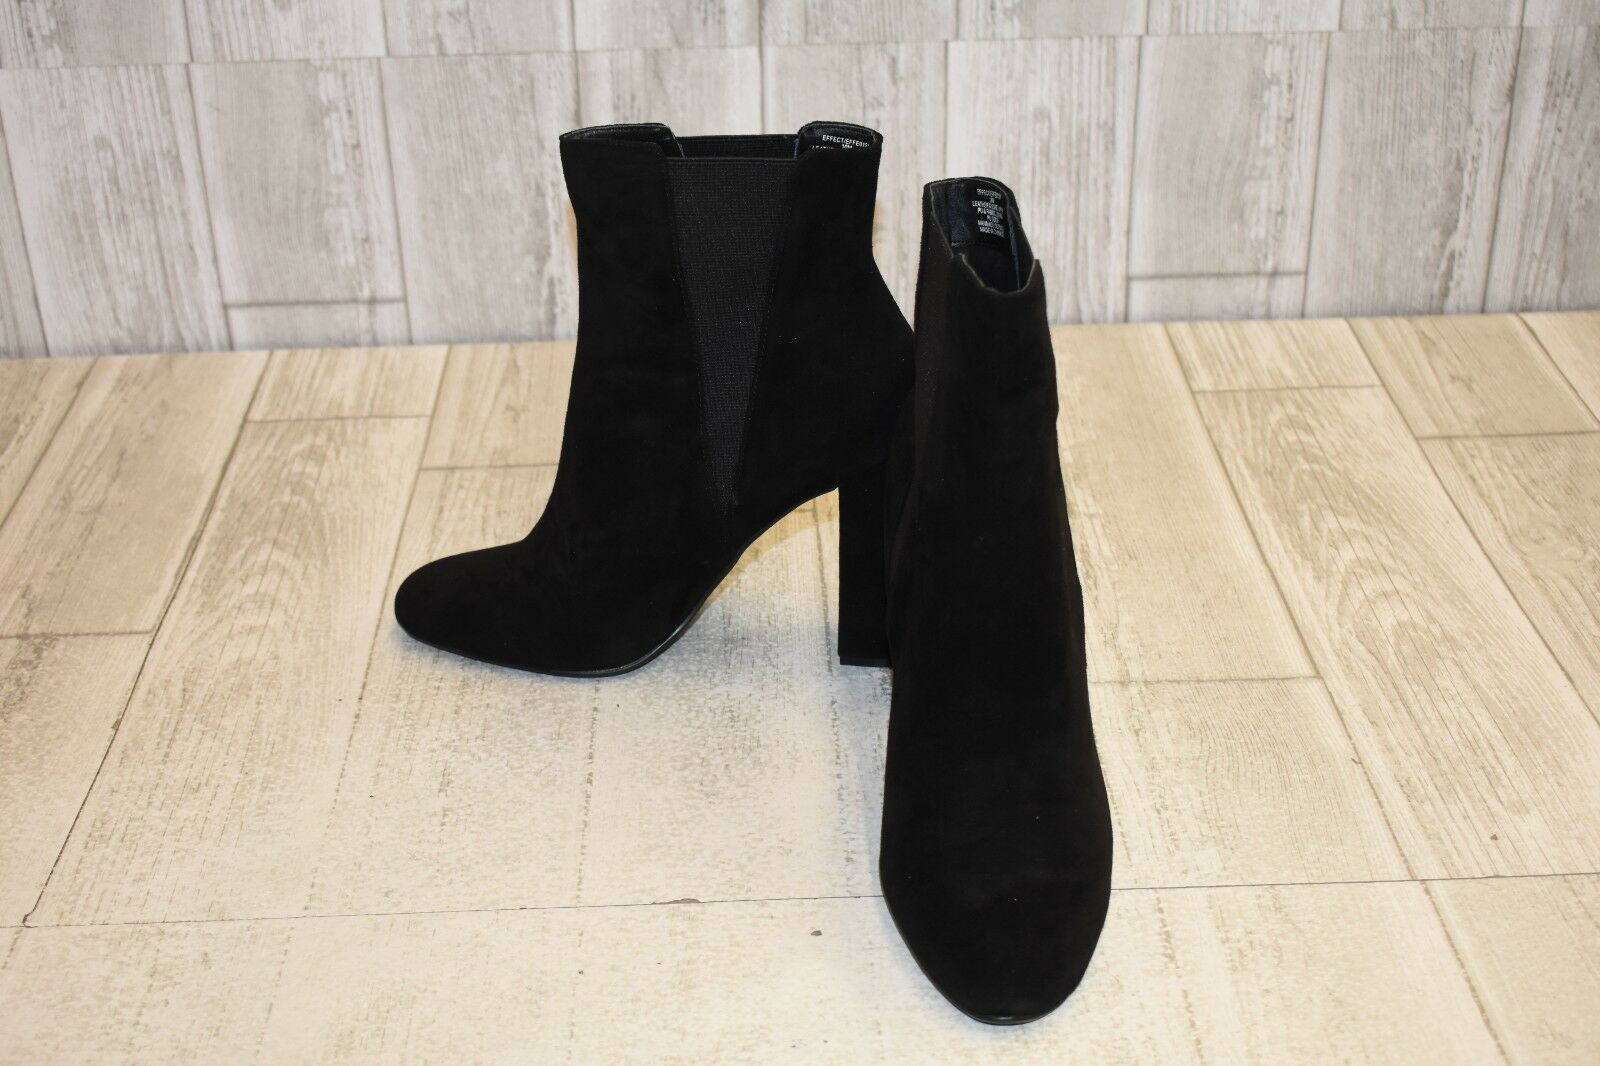 Steve Madden efecto bota-mujer 'S Talla 10M, 10M, 10M, Negro 9c5c1b